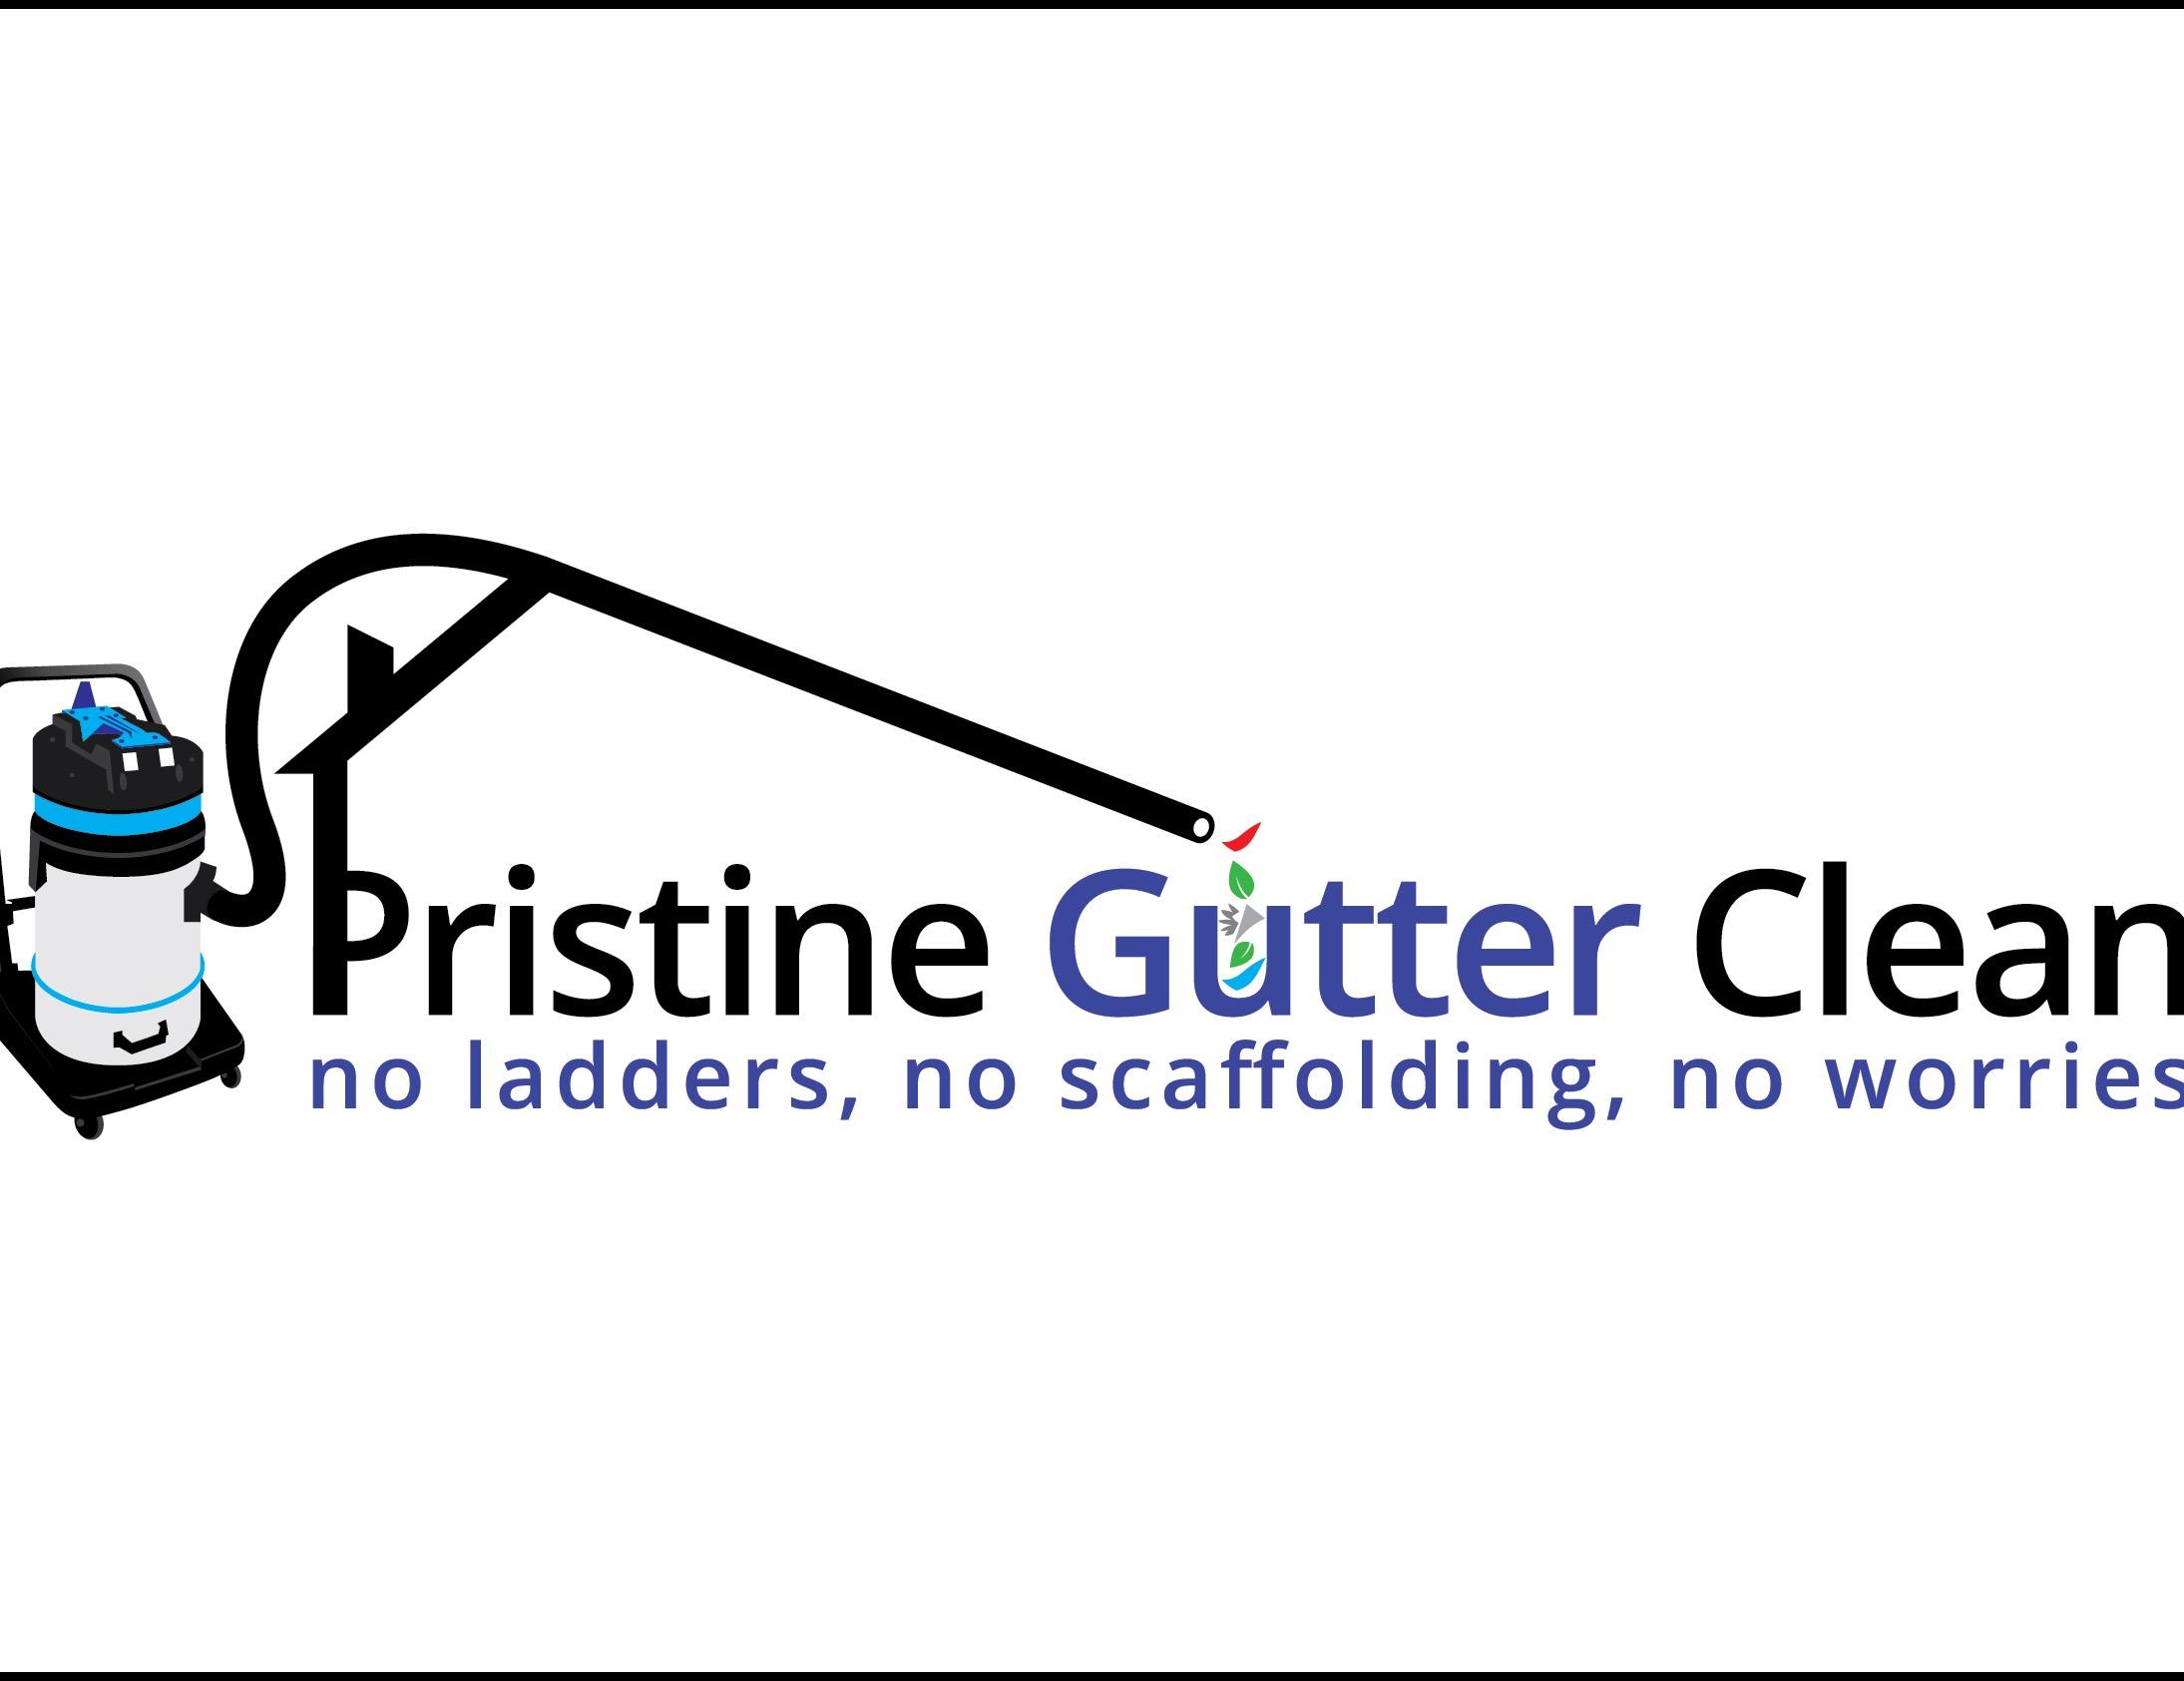 Pristine Gutter Clean Limited